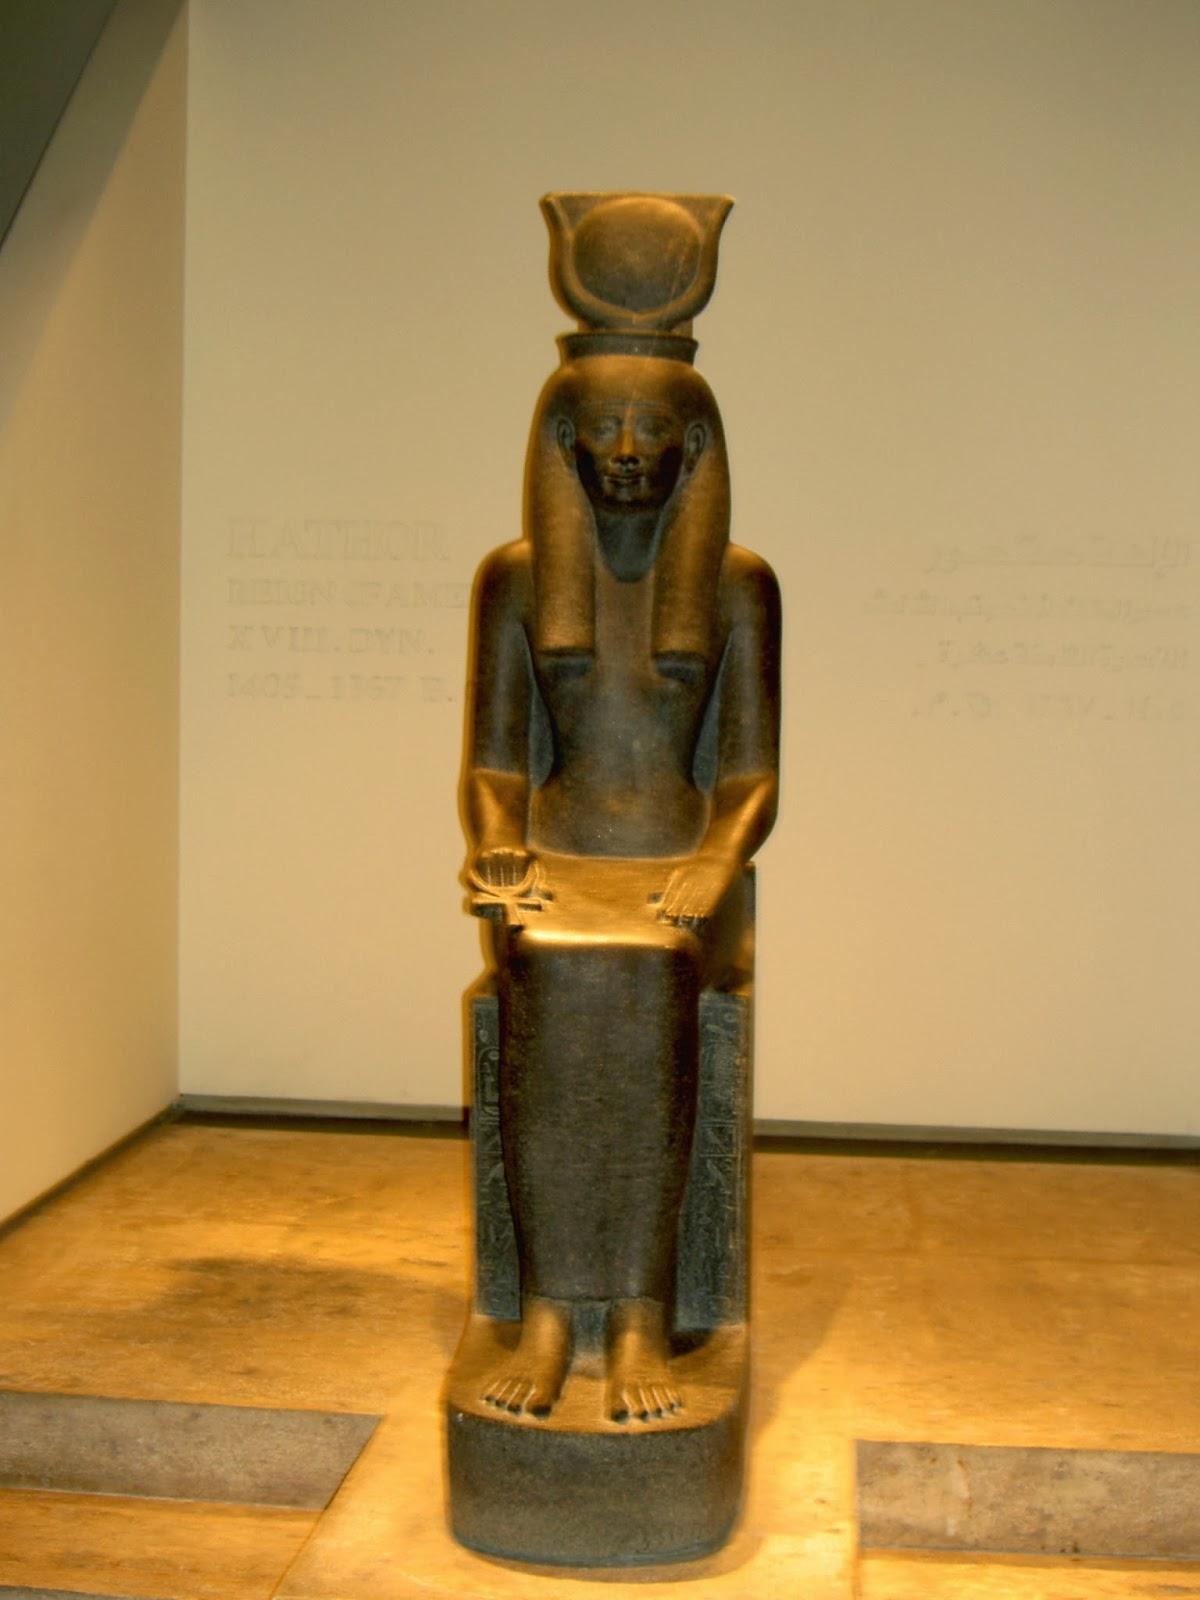 Shams i bala and the historical shambhala kingdom october 2013 - God and goddess statues ...